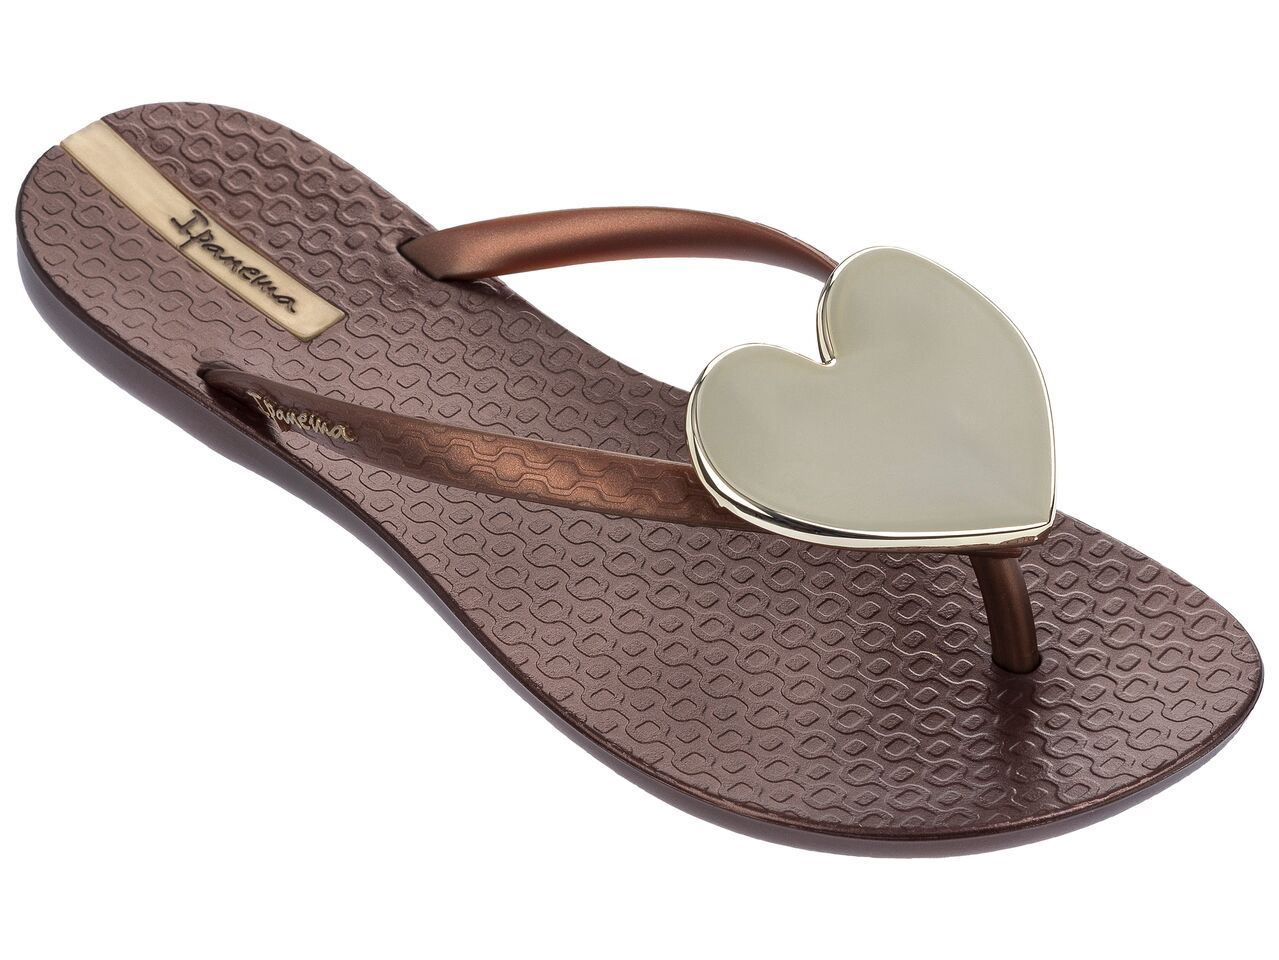 3c13e0cbf90 Ipanema Wave Maxi Heart Flip Flops Slim Footbed Beach Sandals 82120 ...